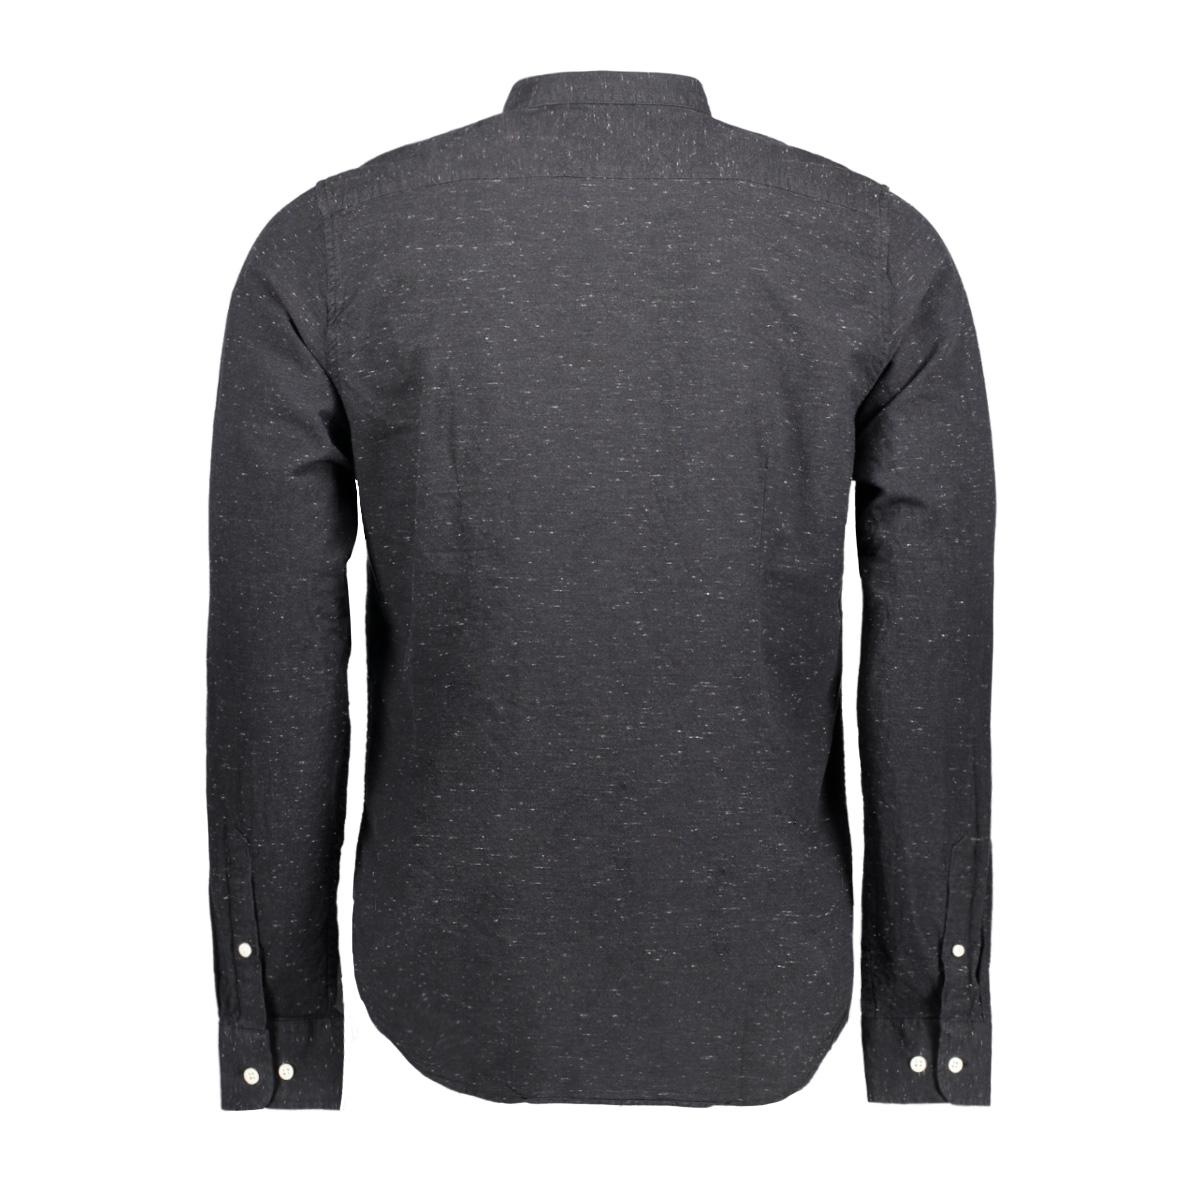 h71234 garcia overhemd 337 shade